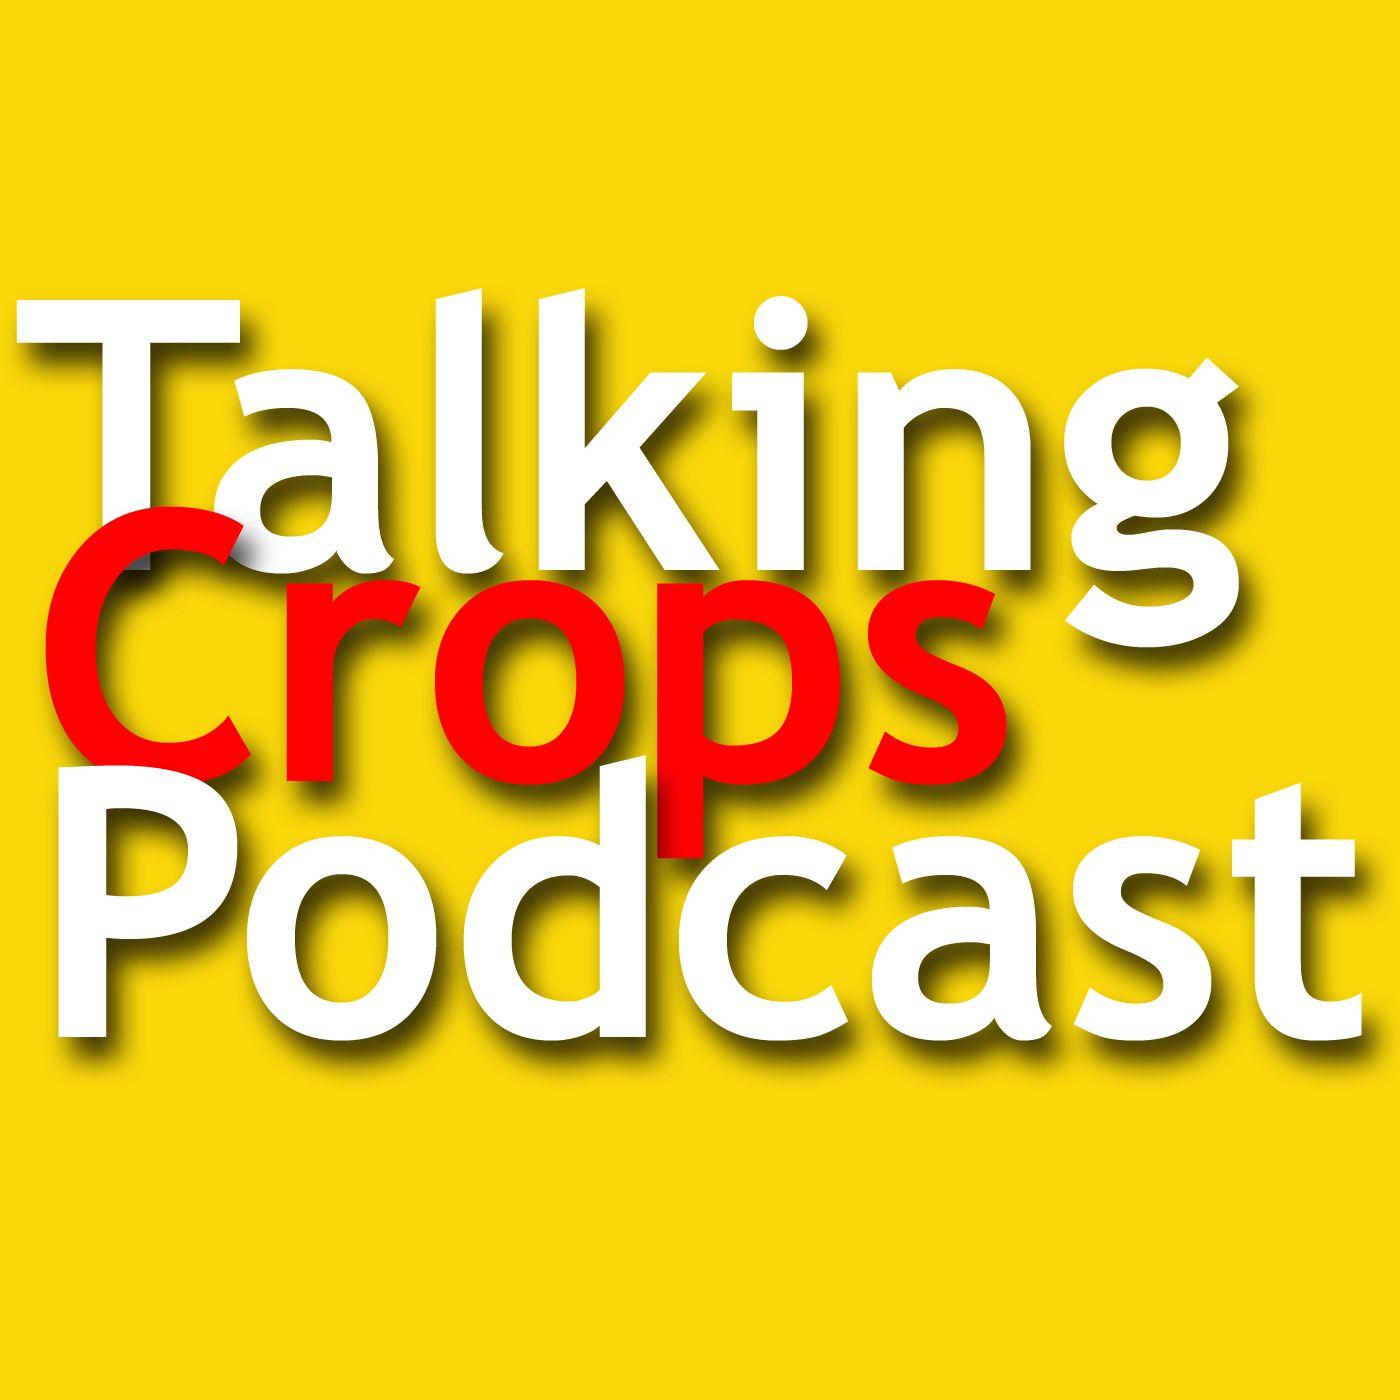 Talking Crops